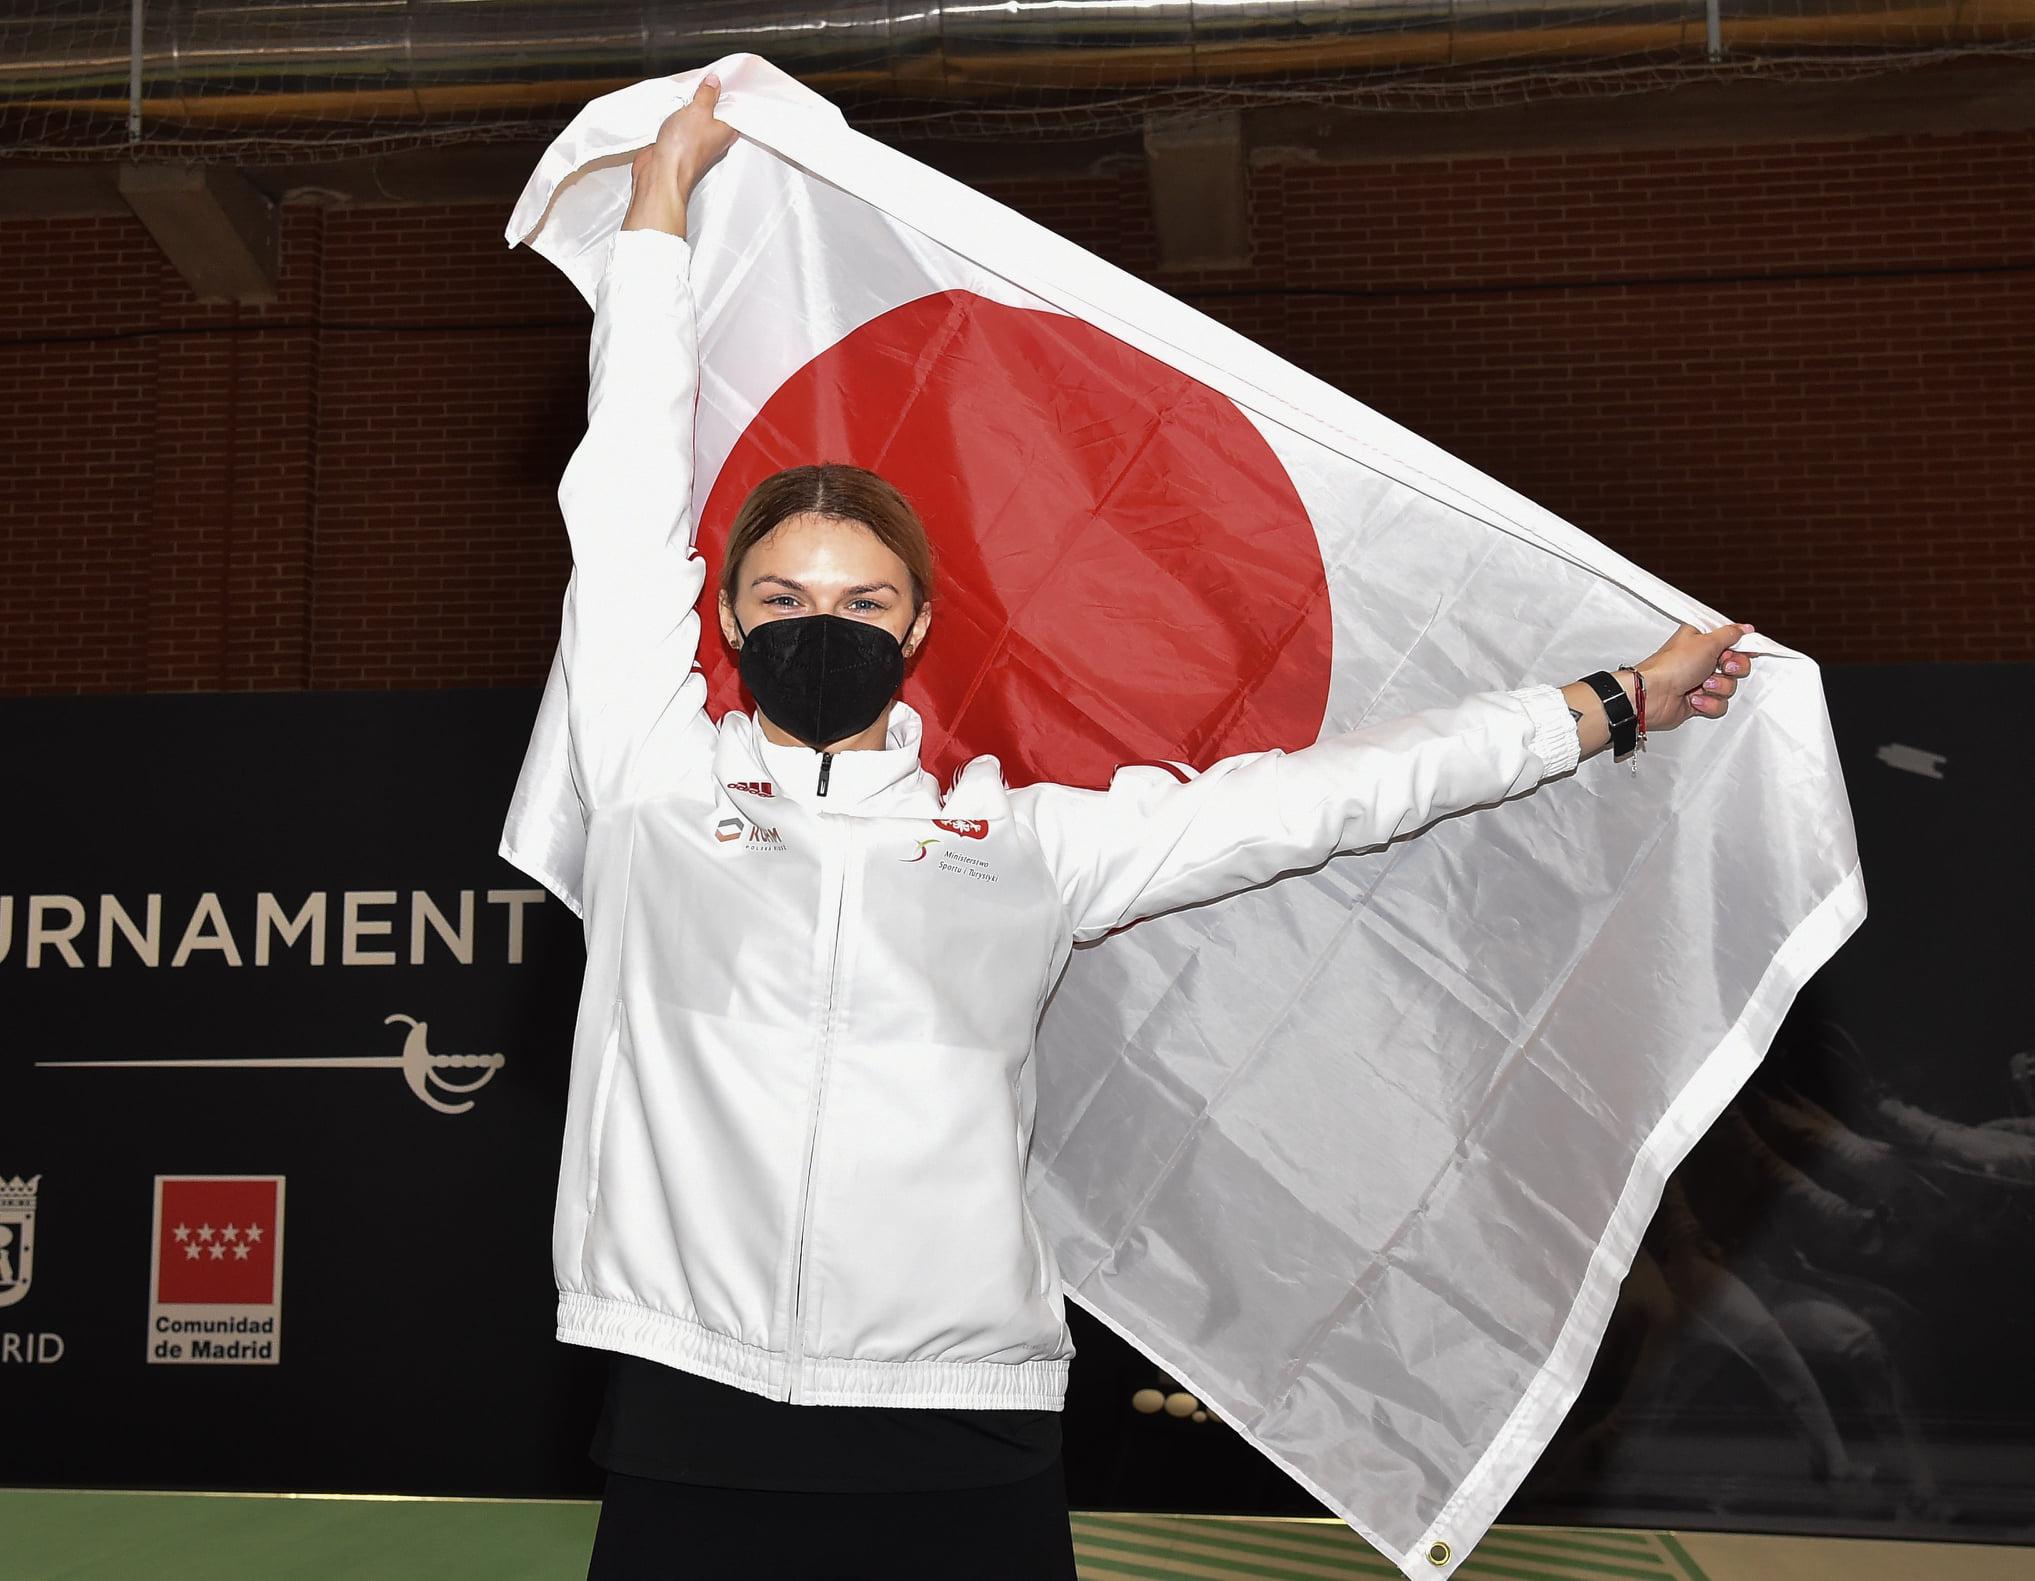 Esgrimista polonesa Martyna Jelinska segura bandeira japonesa